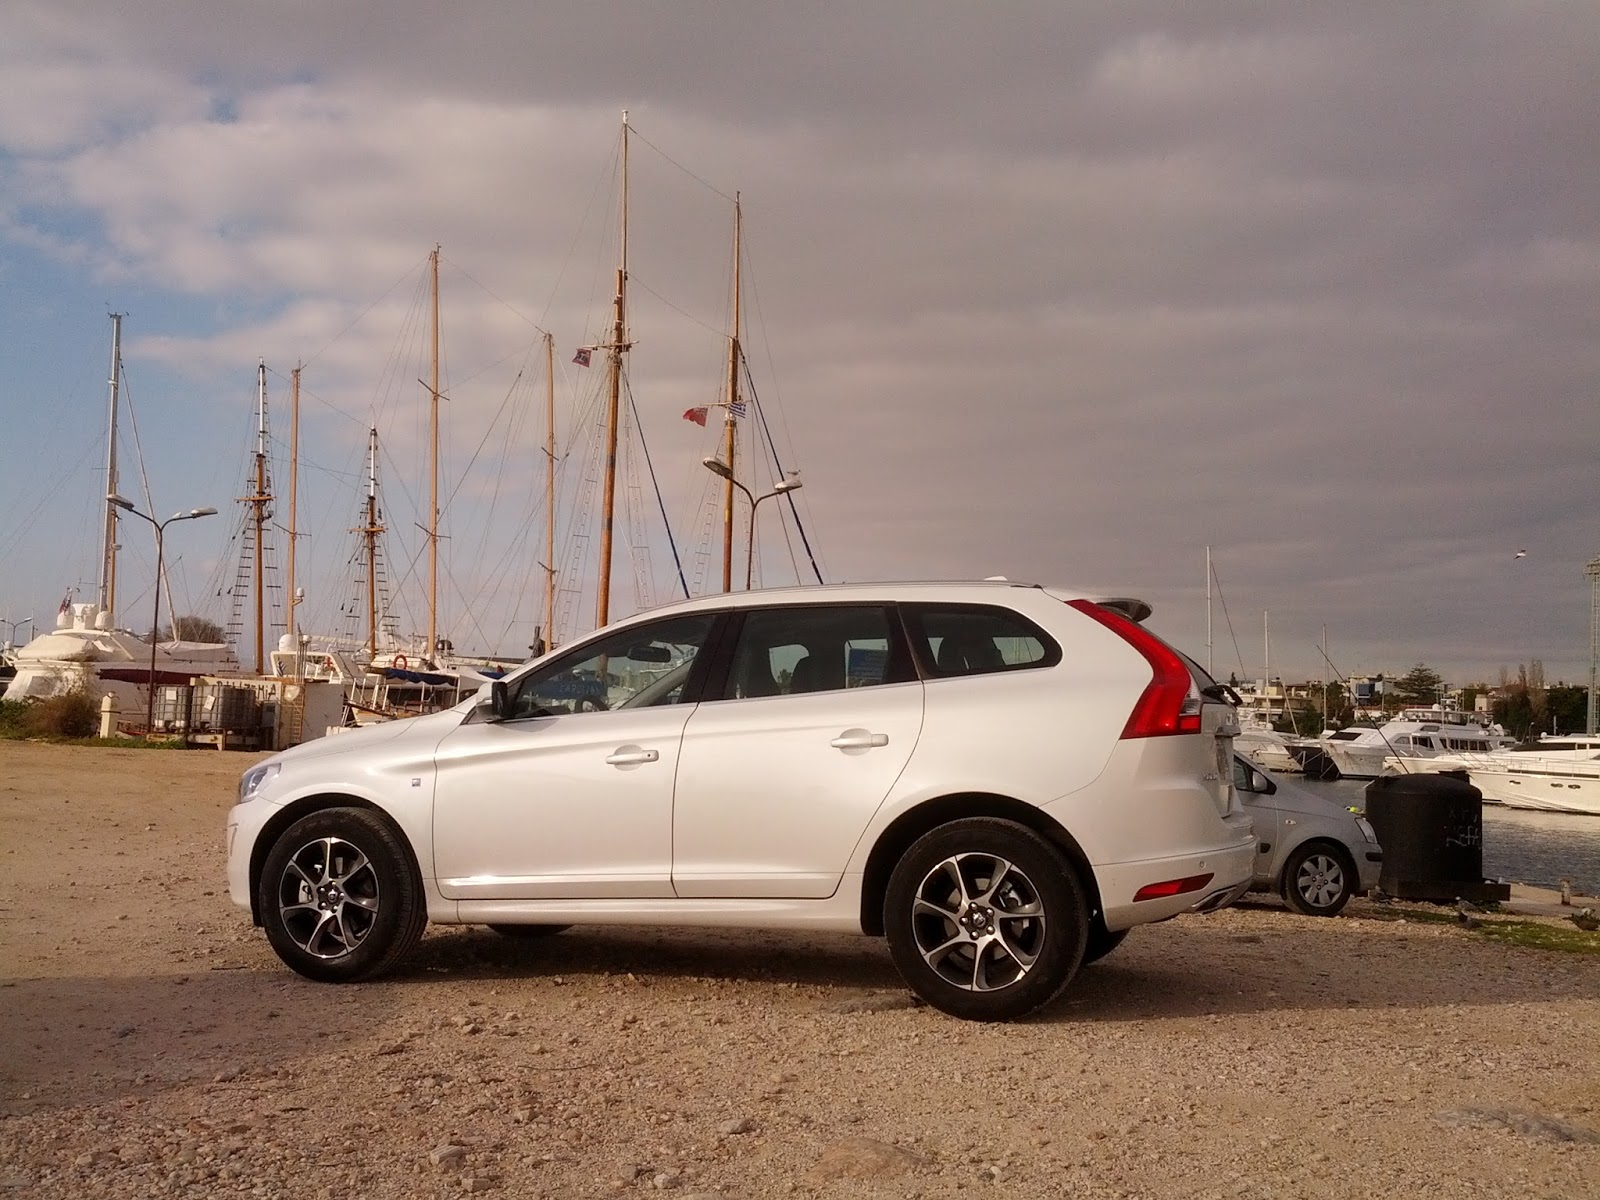 IMG 20151209 145112 Γιατί το Volvo XC60 είναι εθιστικό